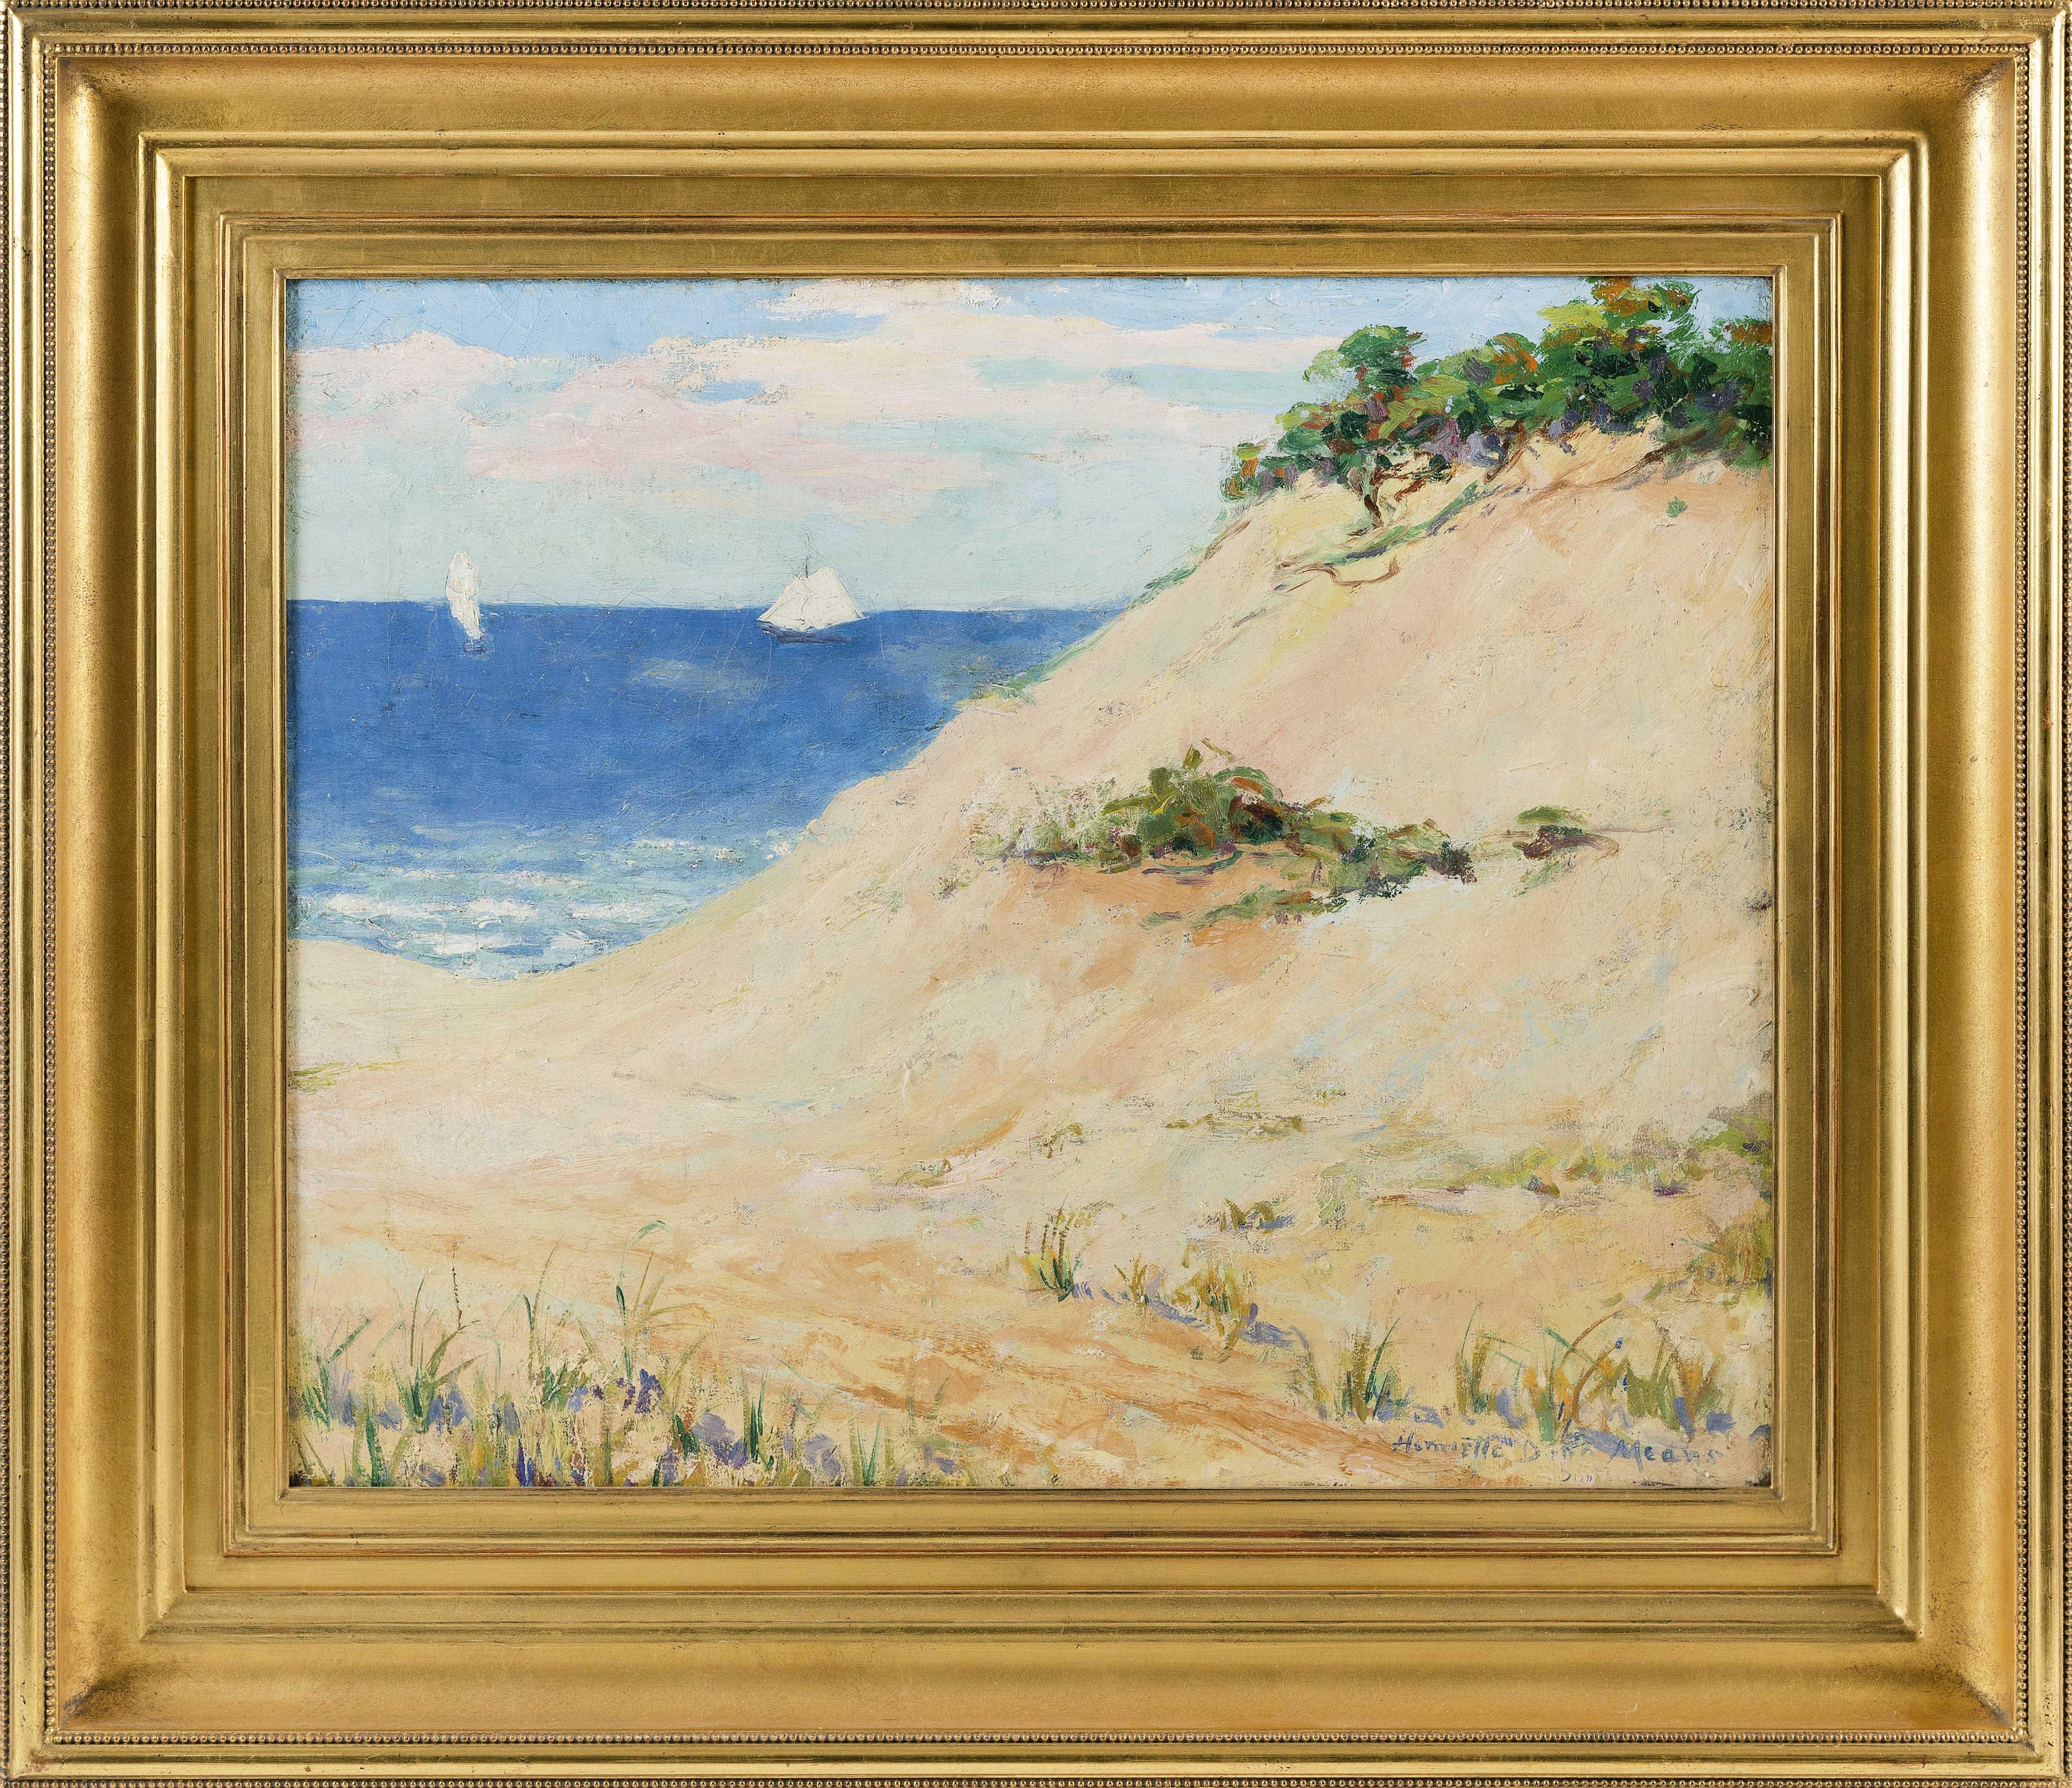 HENRIETTA DUNN MEARS (Massachusetts, 1877-1970), Dune scene, likely Cape Cod., Oil on canvas, 18